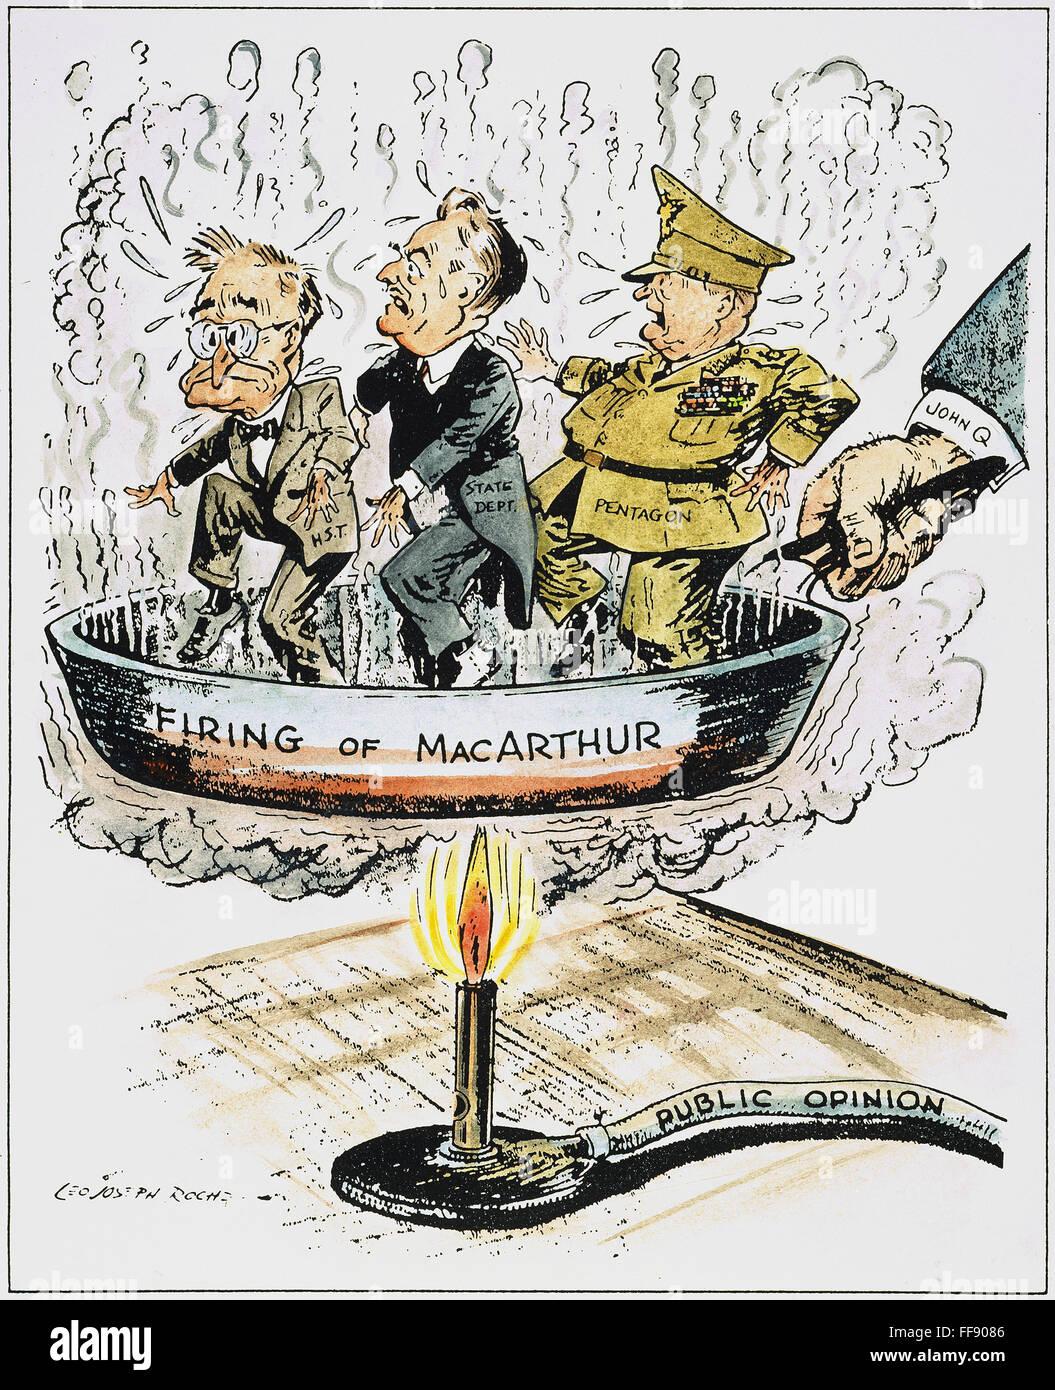 Firing Of Macarthur Namerican Cartoon By L J Roche